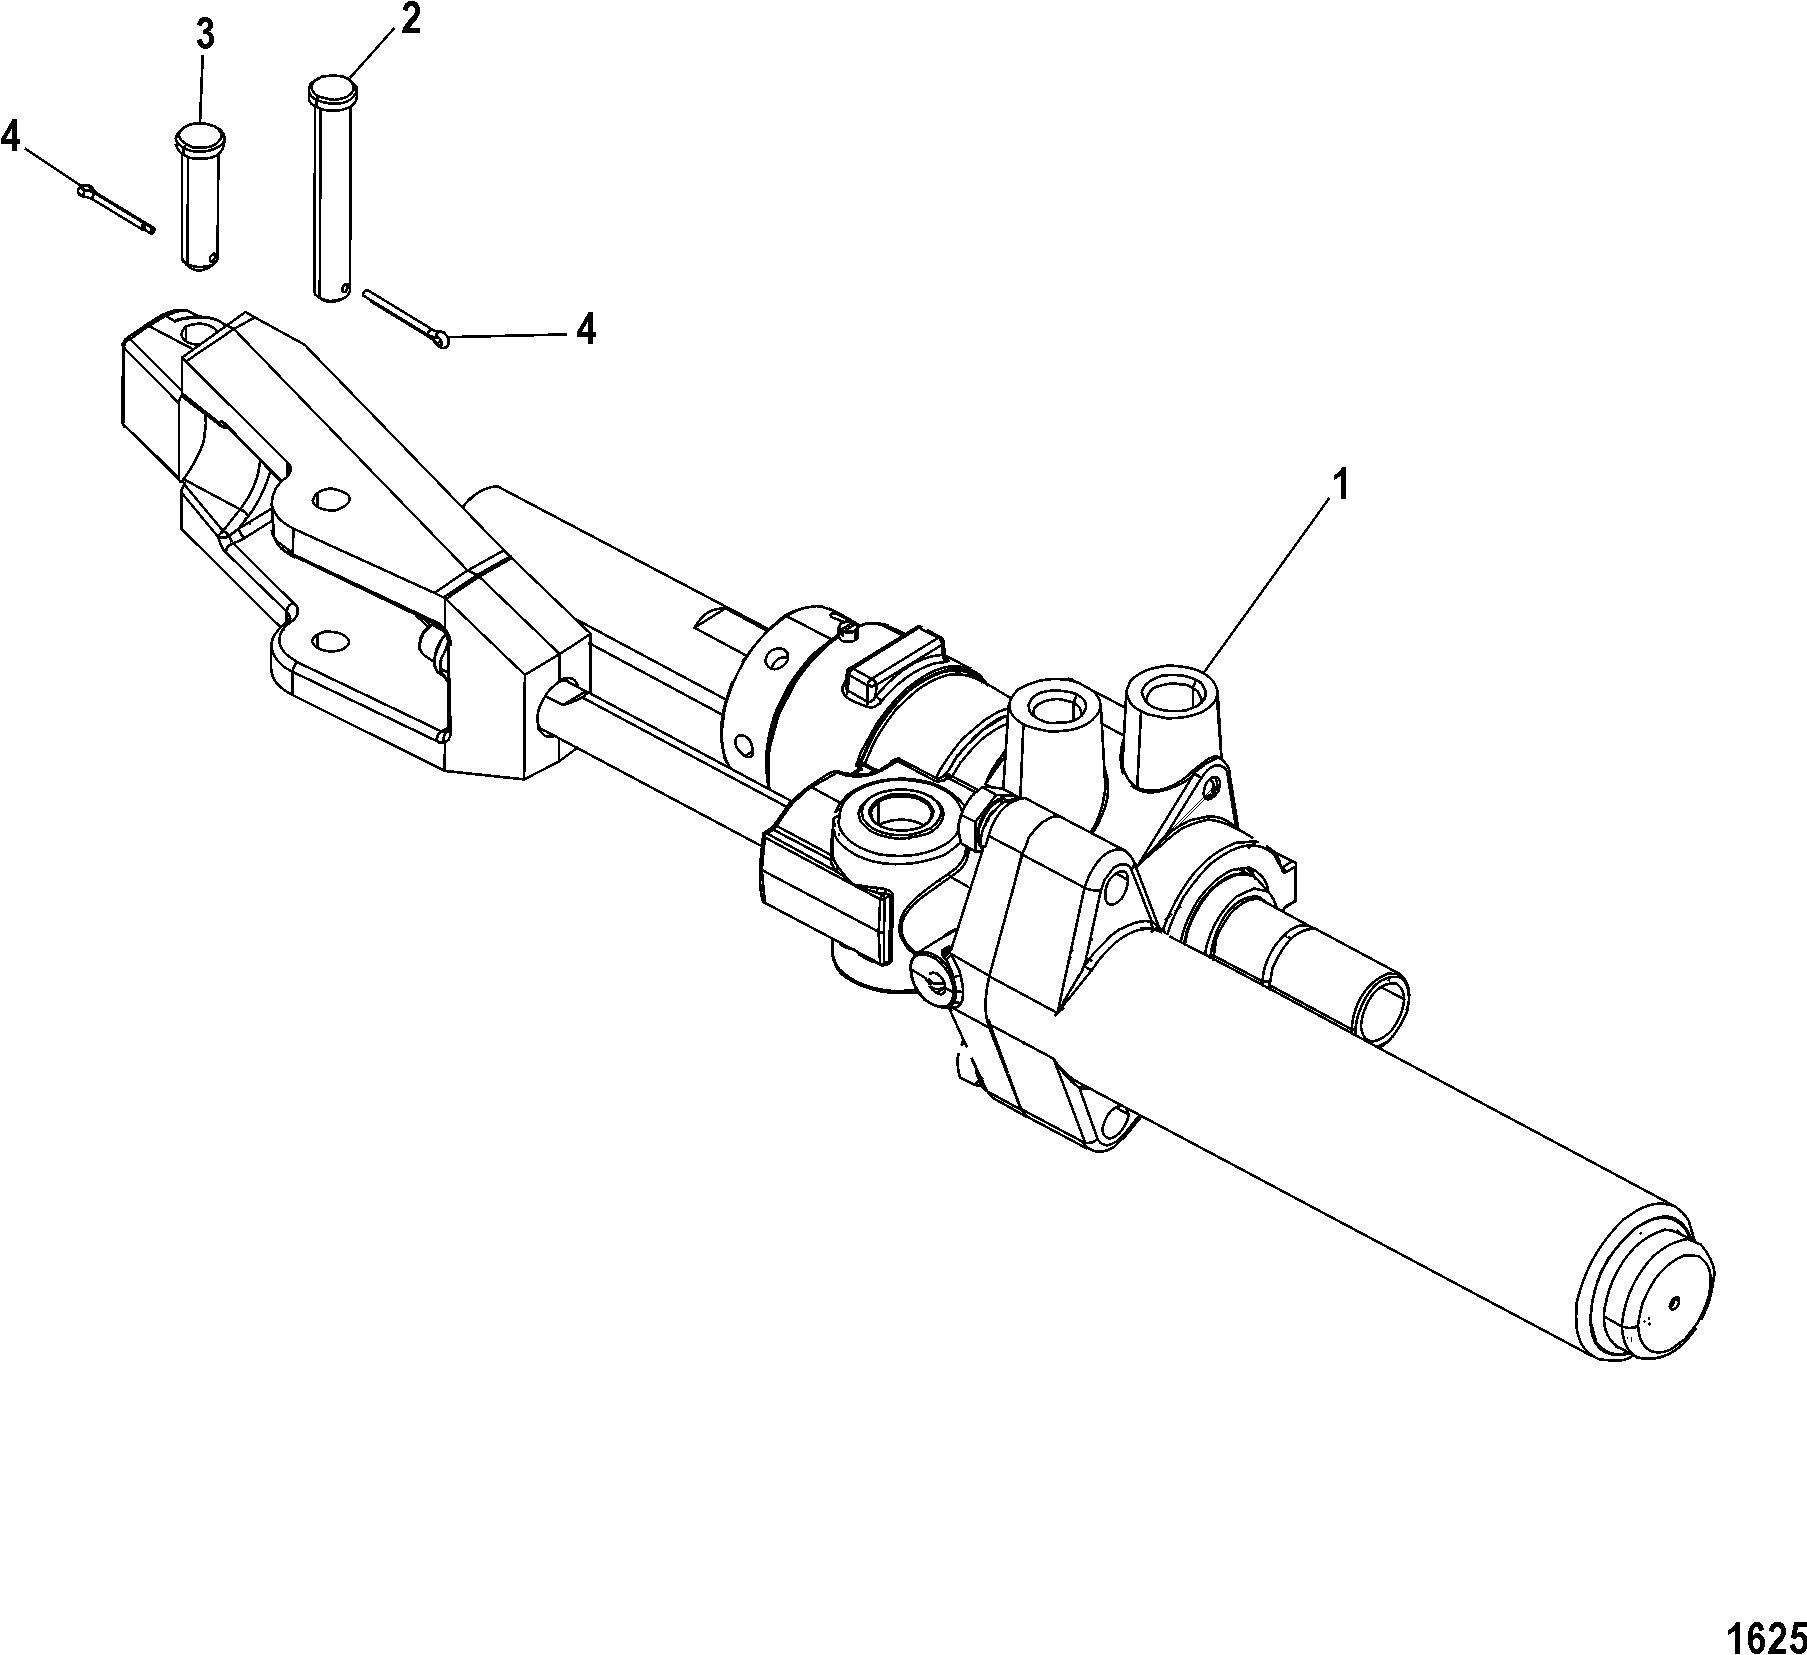 Power Steering For Mercruiser Alpha One Gen Ii Sterndrive